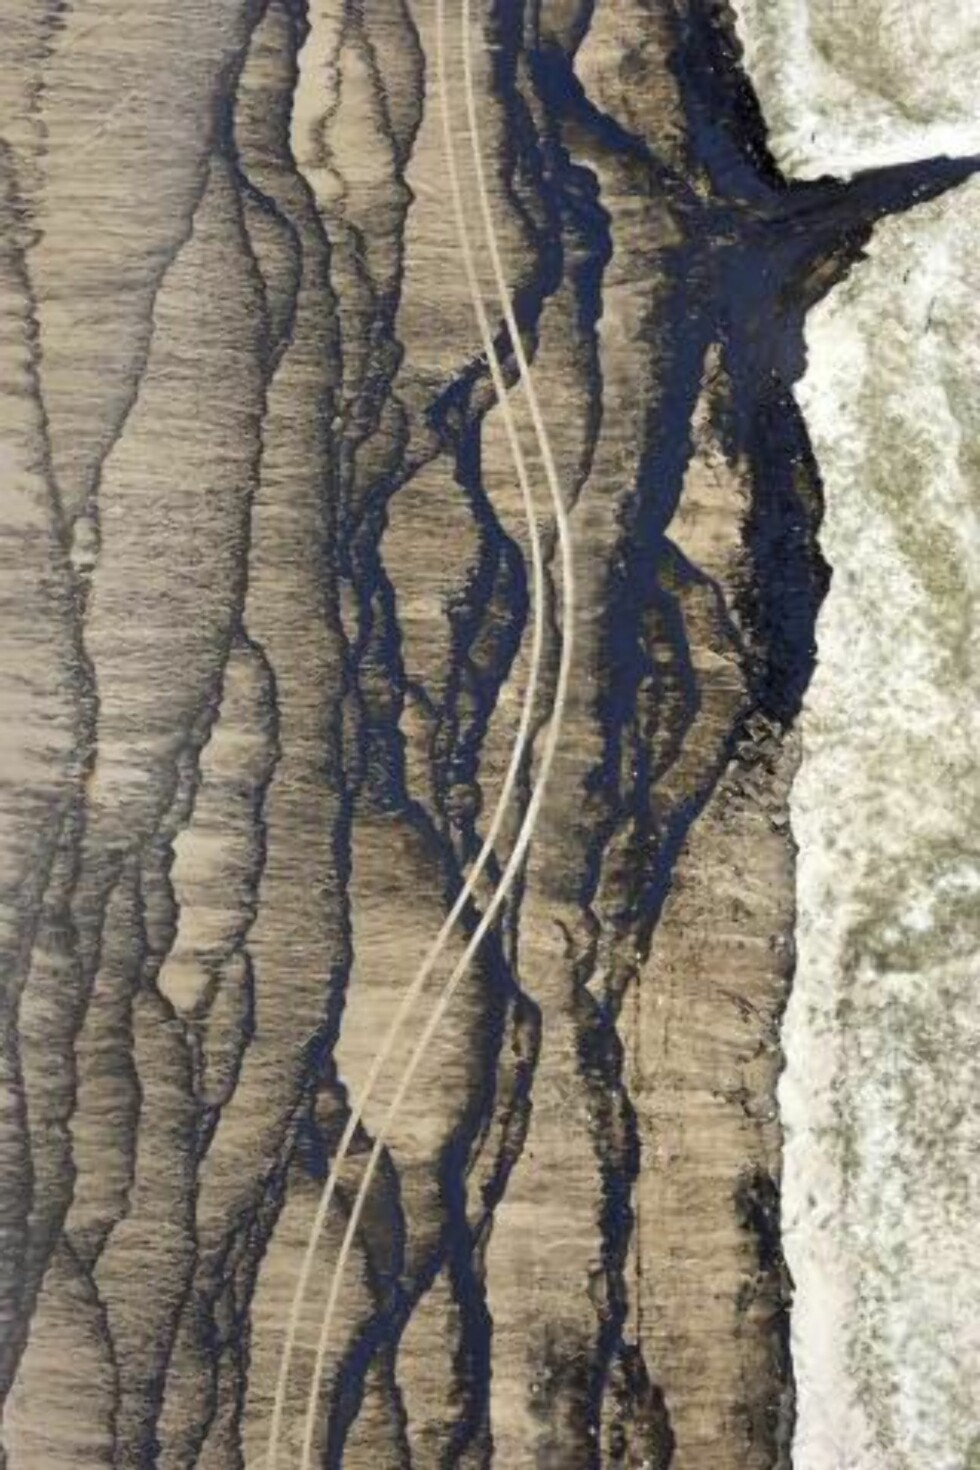 ERKLÆRT KATASTROFEOMRÅDE: Oljesølet har satt sine spor på denne engang så urørte stranden på Moreton Island. Foto: Scanpix